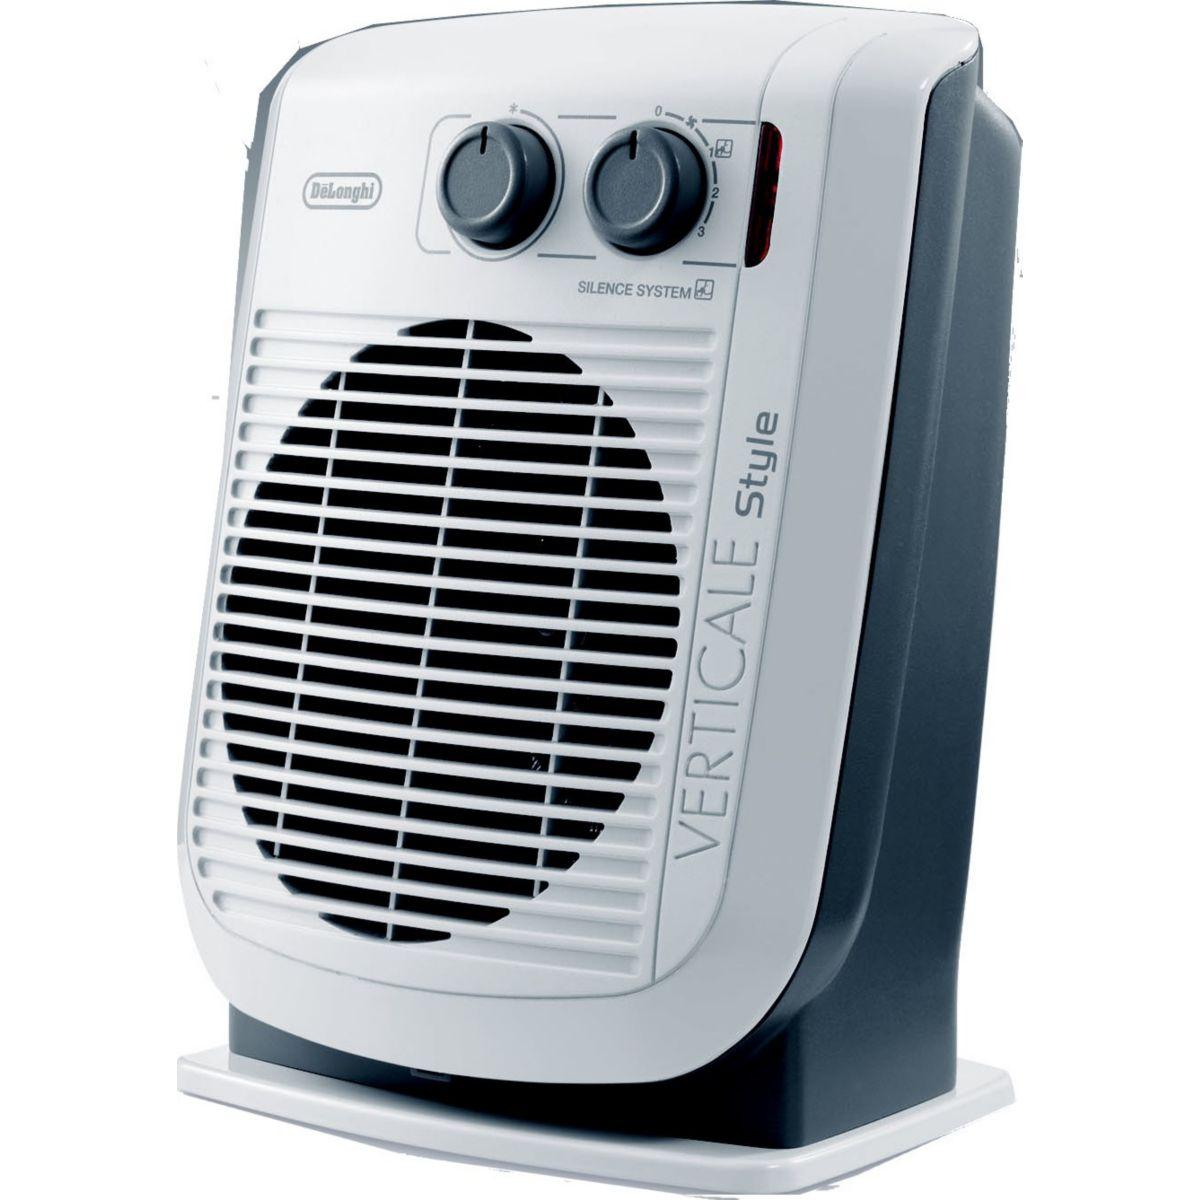 delonghi hvf3031 chauffage soufflant de salle de bain vertical style 2200 watts comparer. Black Bedroom Furniture Sets. Home Design Ideas